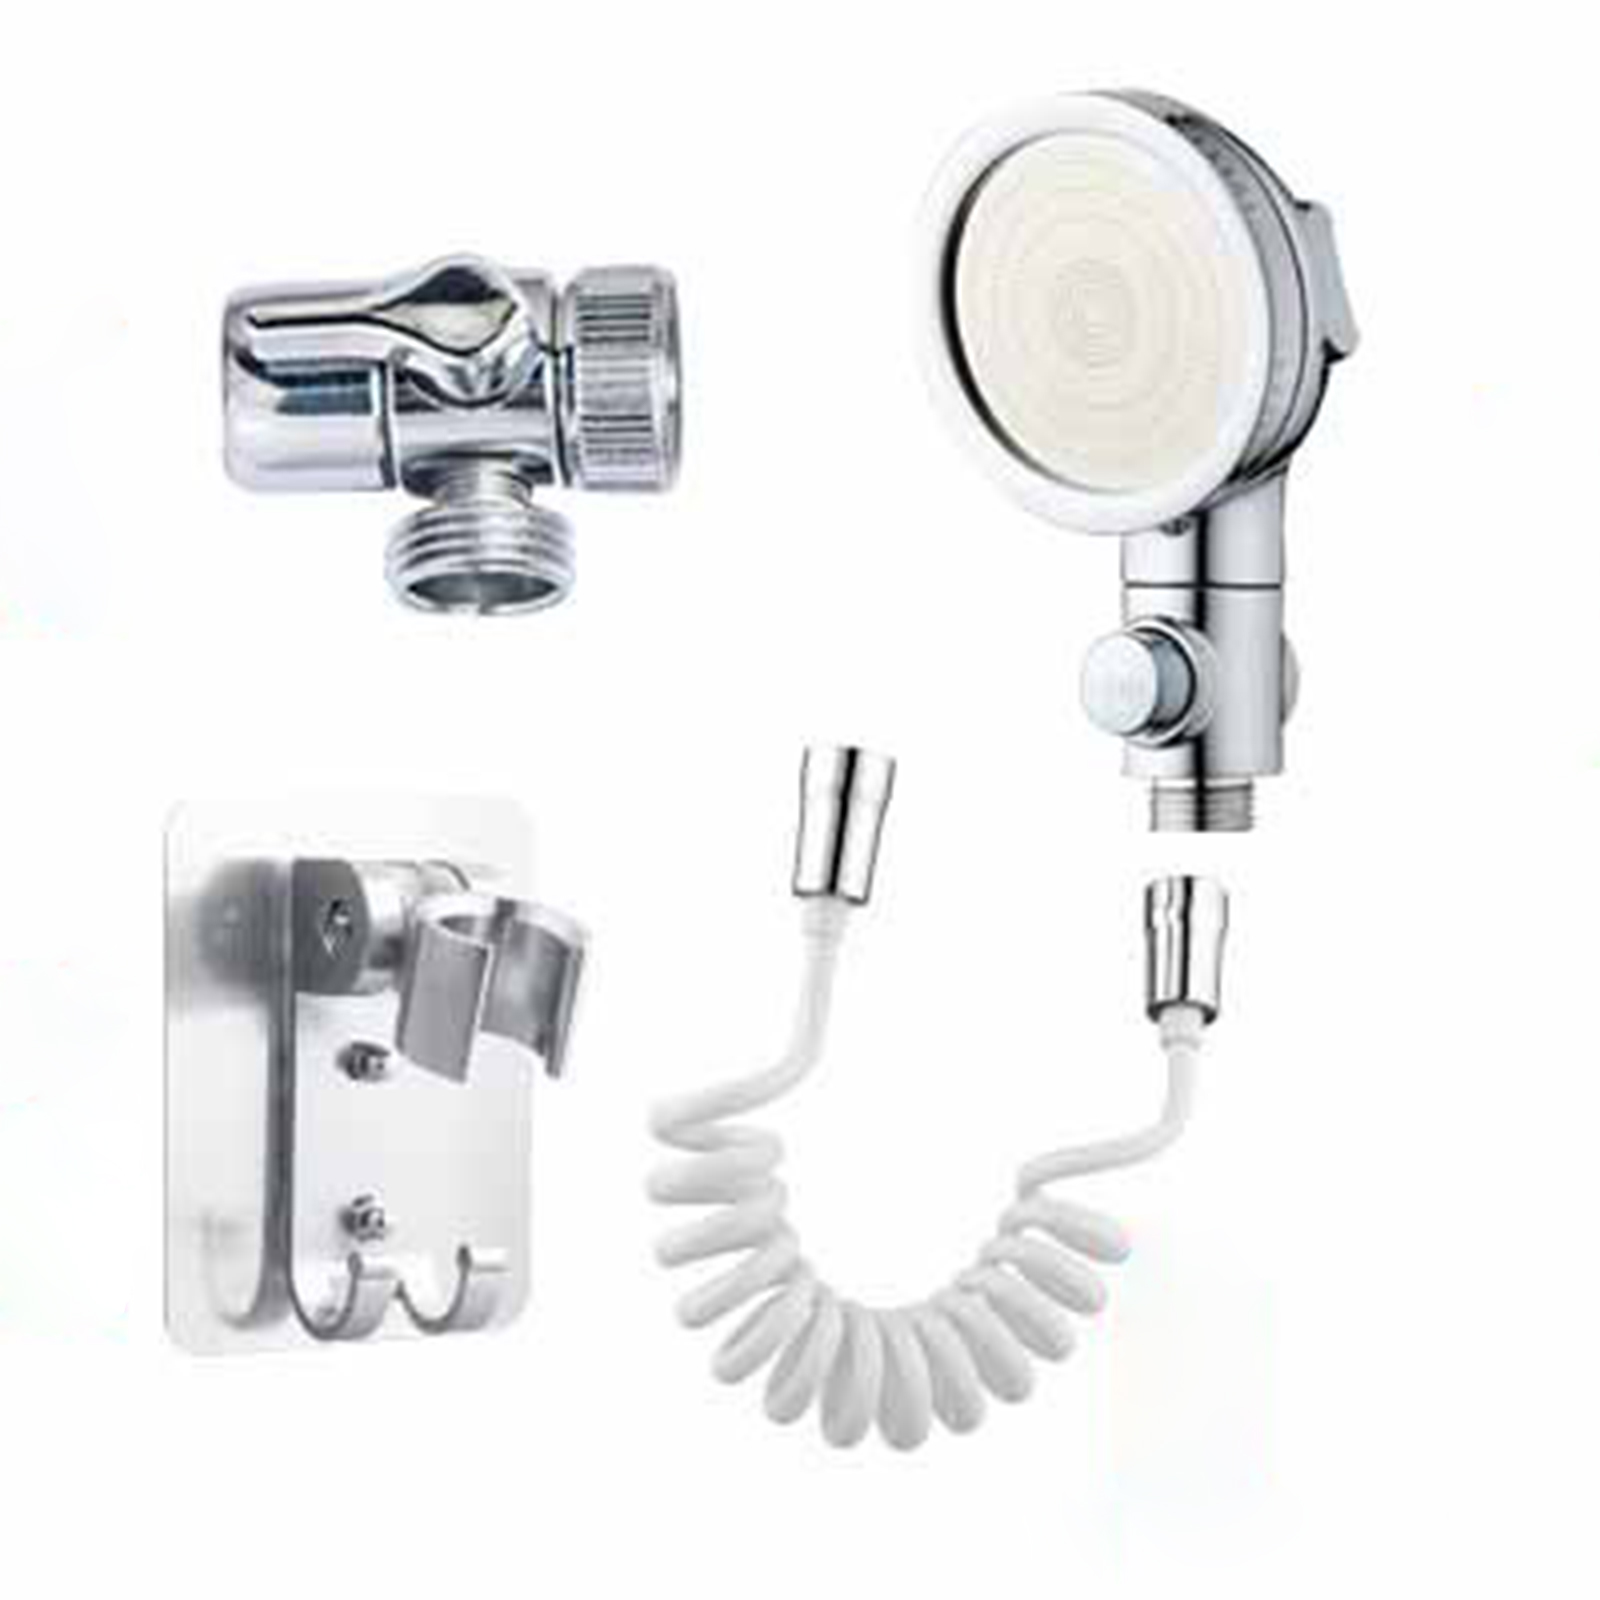 owsoo hand shower bathroom sink sprayer rinser set for hair washing 3 spray modes sink hose sprayer attachment with retractable 1 5m hose bracket for